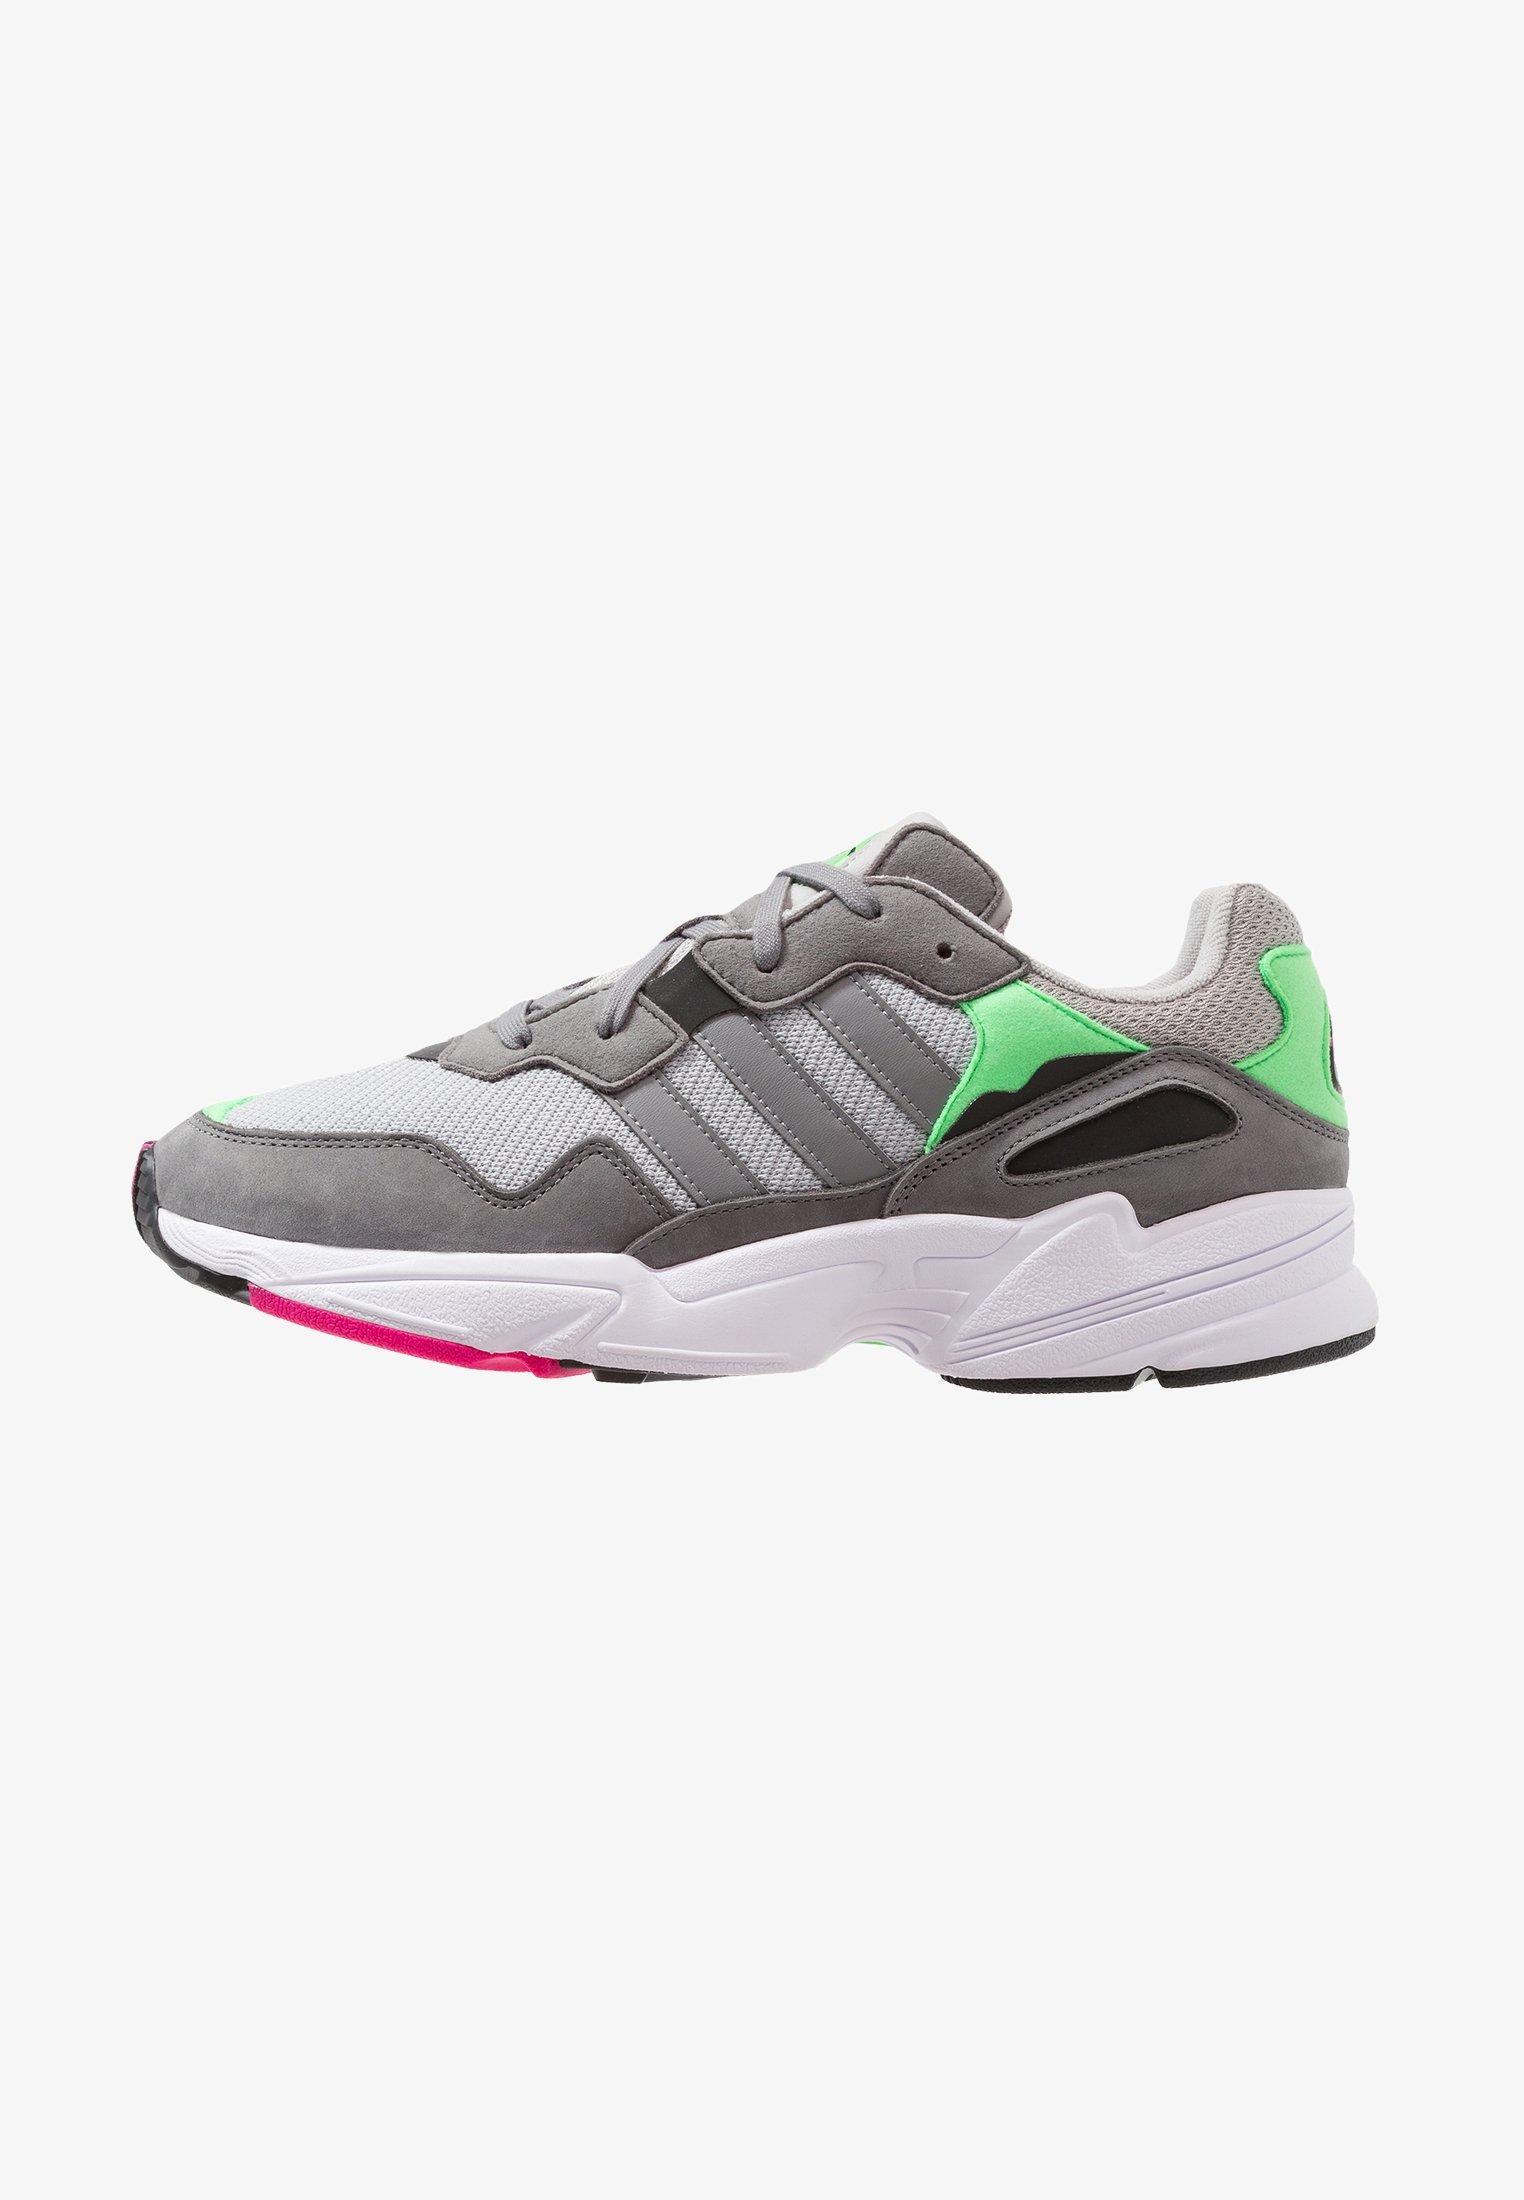 basura Ostentoso Acostumbrados a  adidas Originals YUNG-96 - Trainers - grey two/grey three/shock pink/white  - Zalando.ie